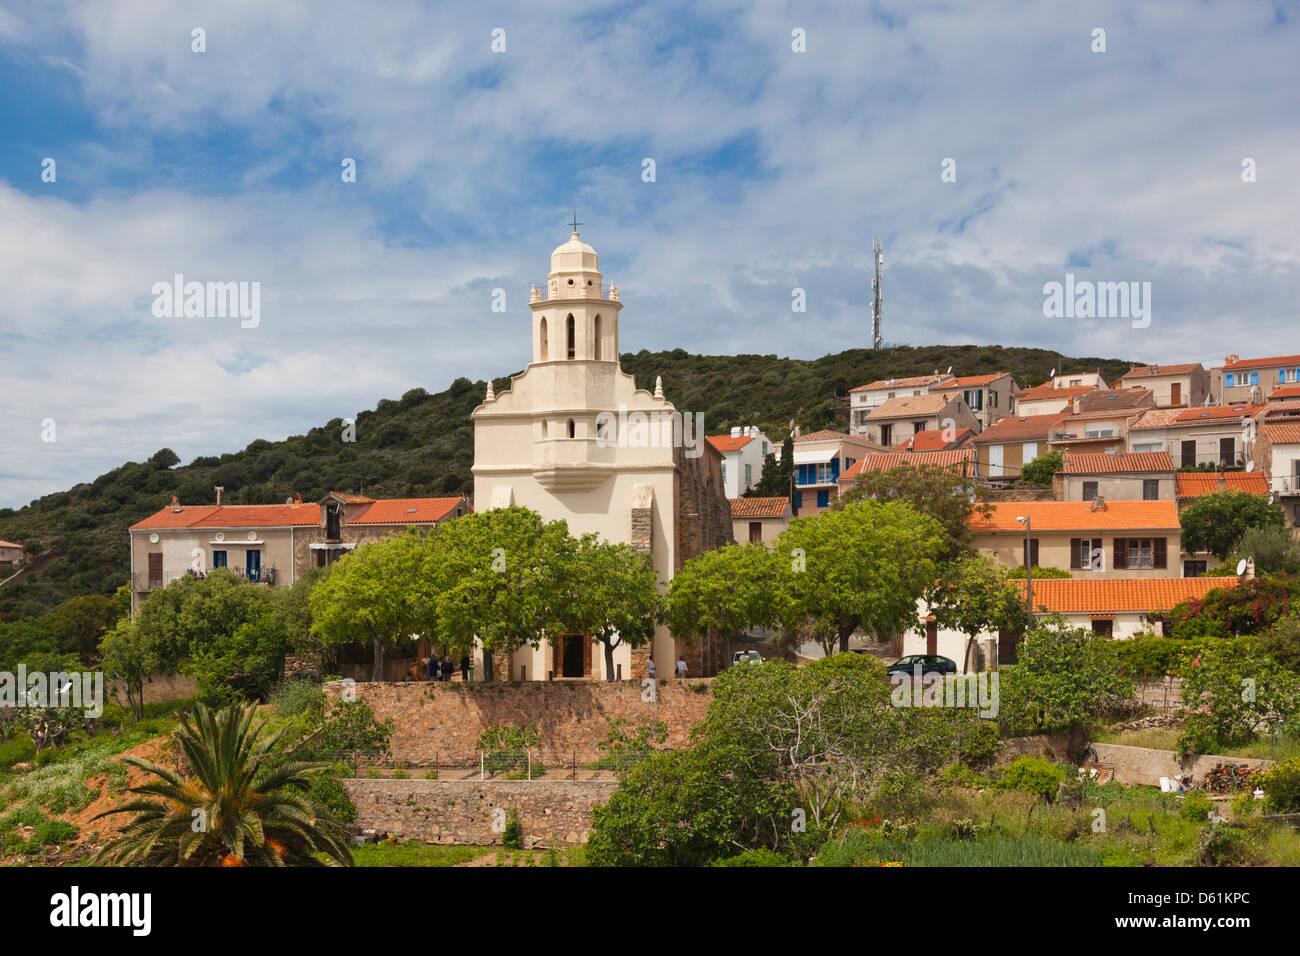 France, Corsica, Cargese, Eglise Catholique de Rite Grec, Greek church, exterior - Stock Image